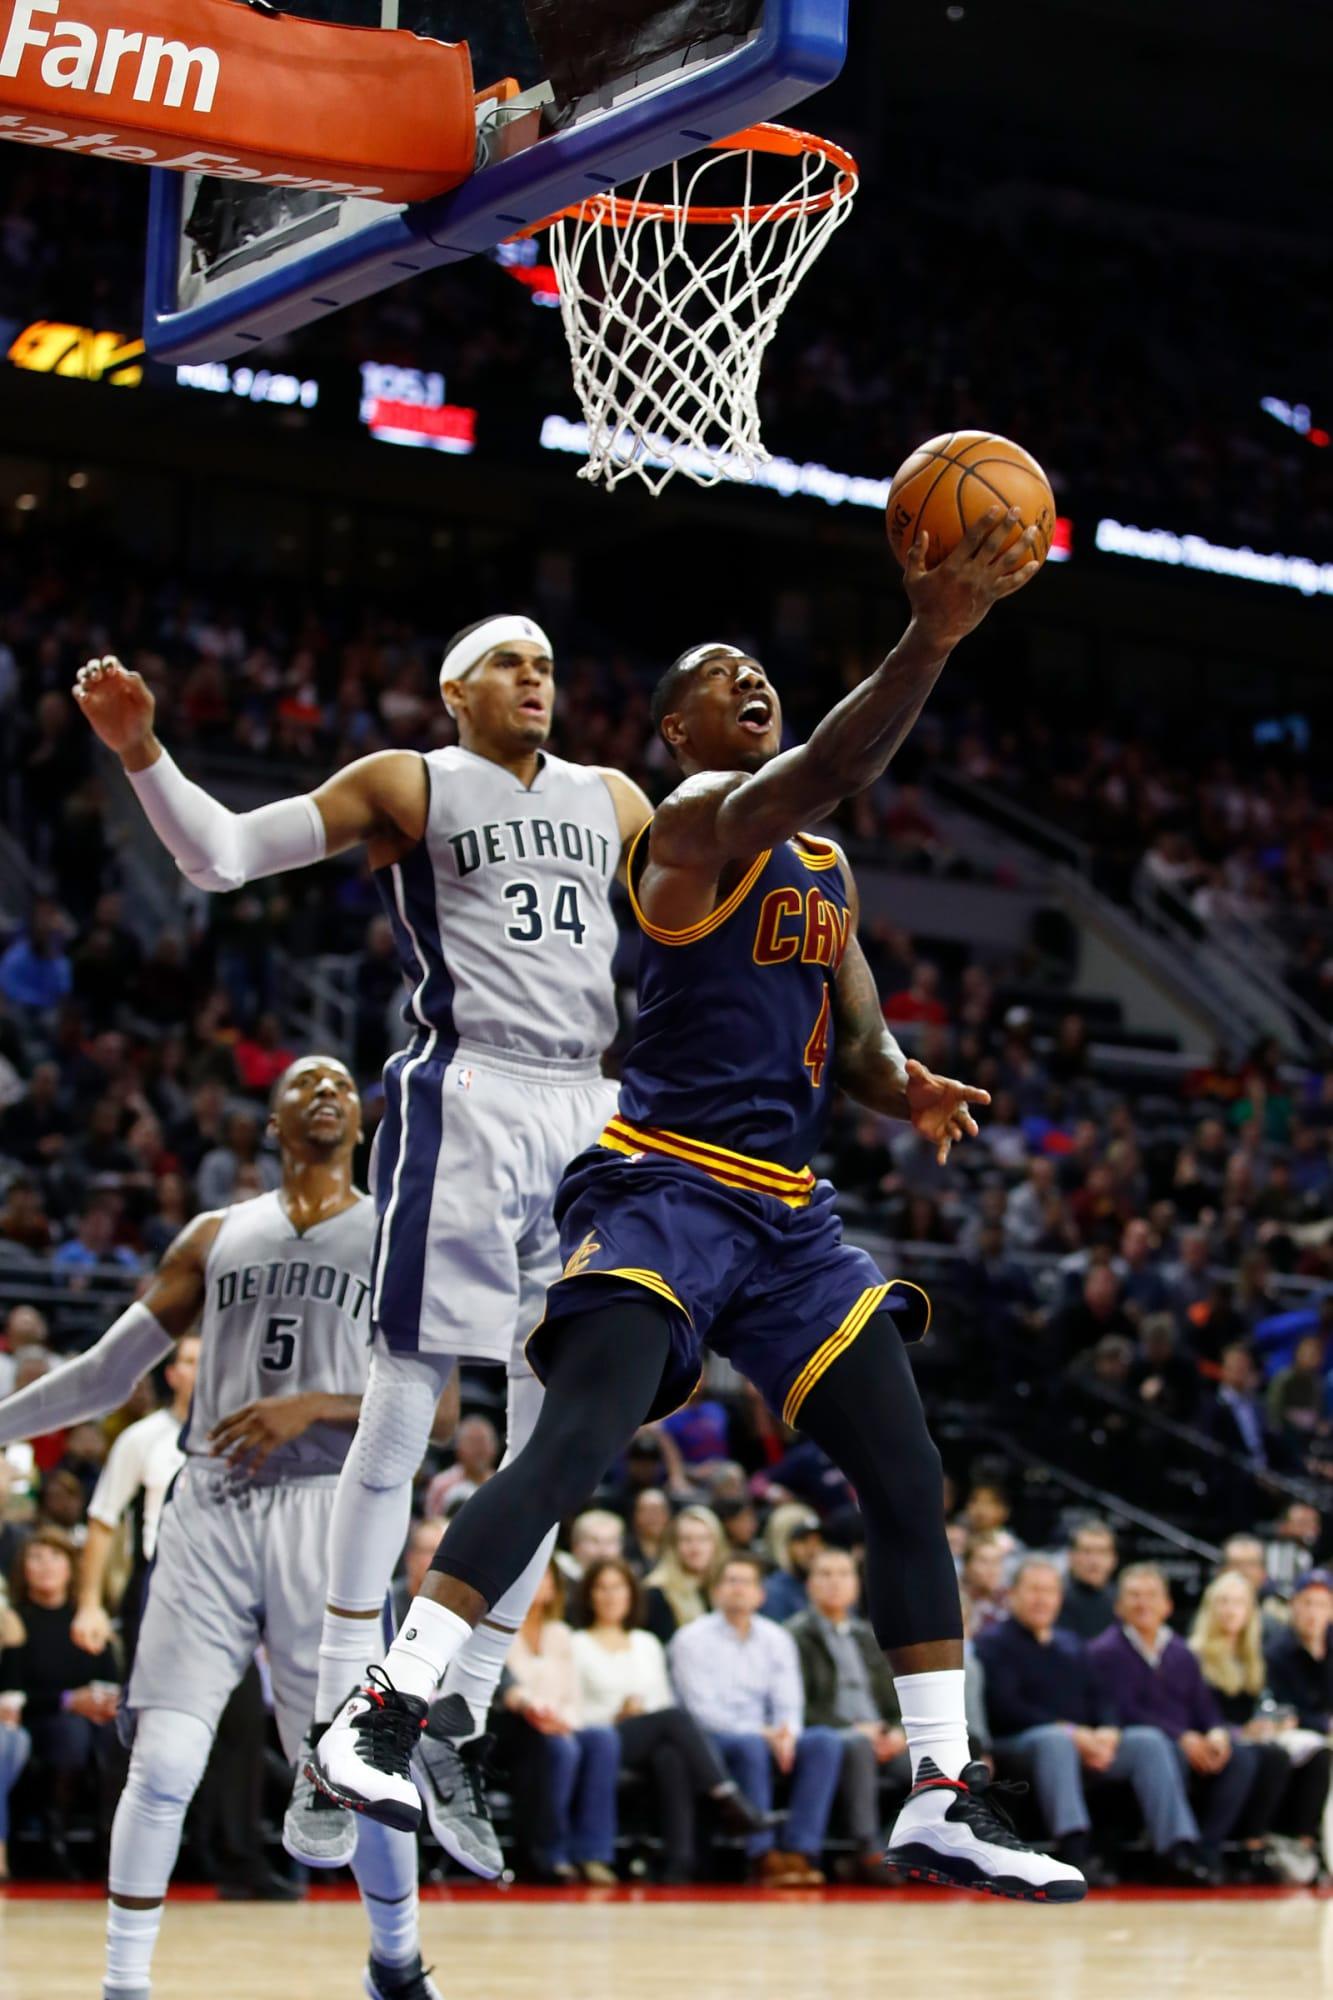 Were the 2016 Detroit Pistons underachievers? - Piston Powered